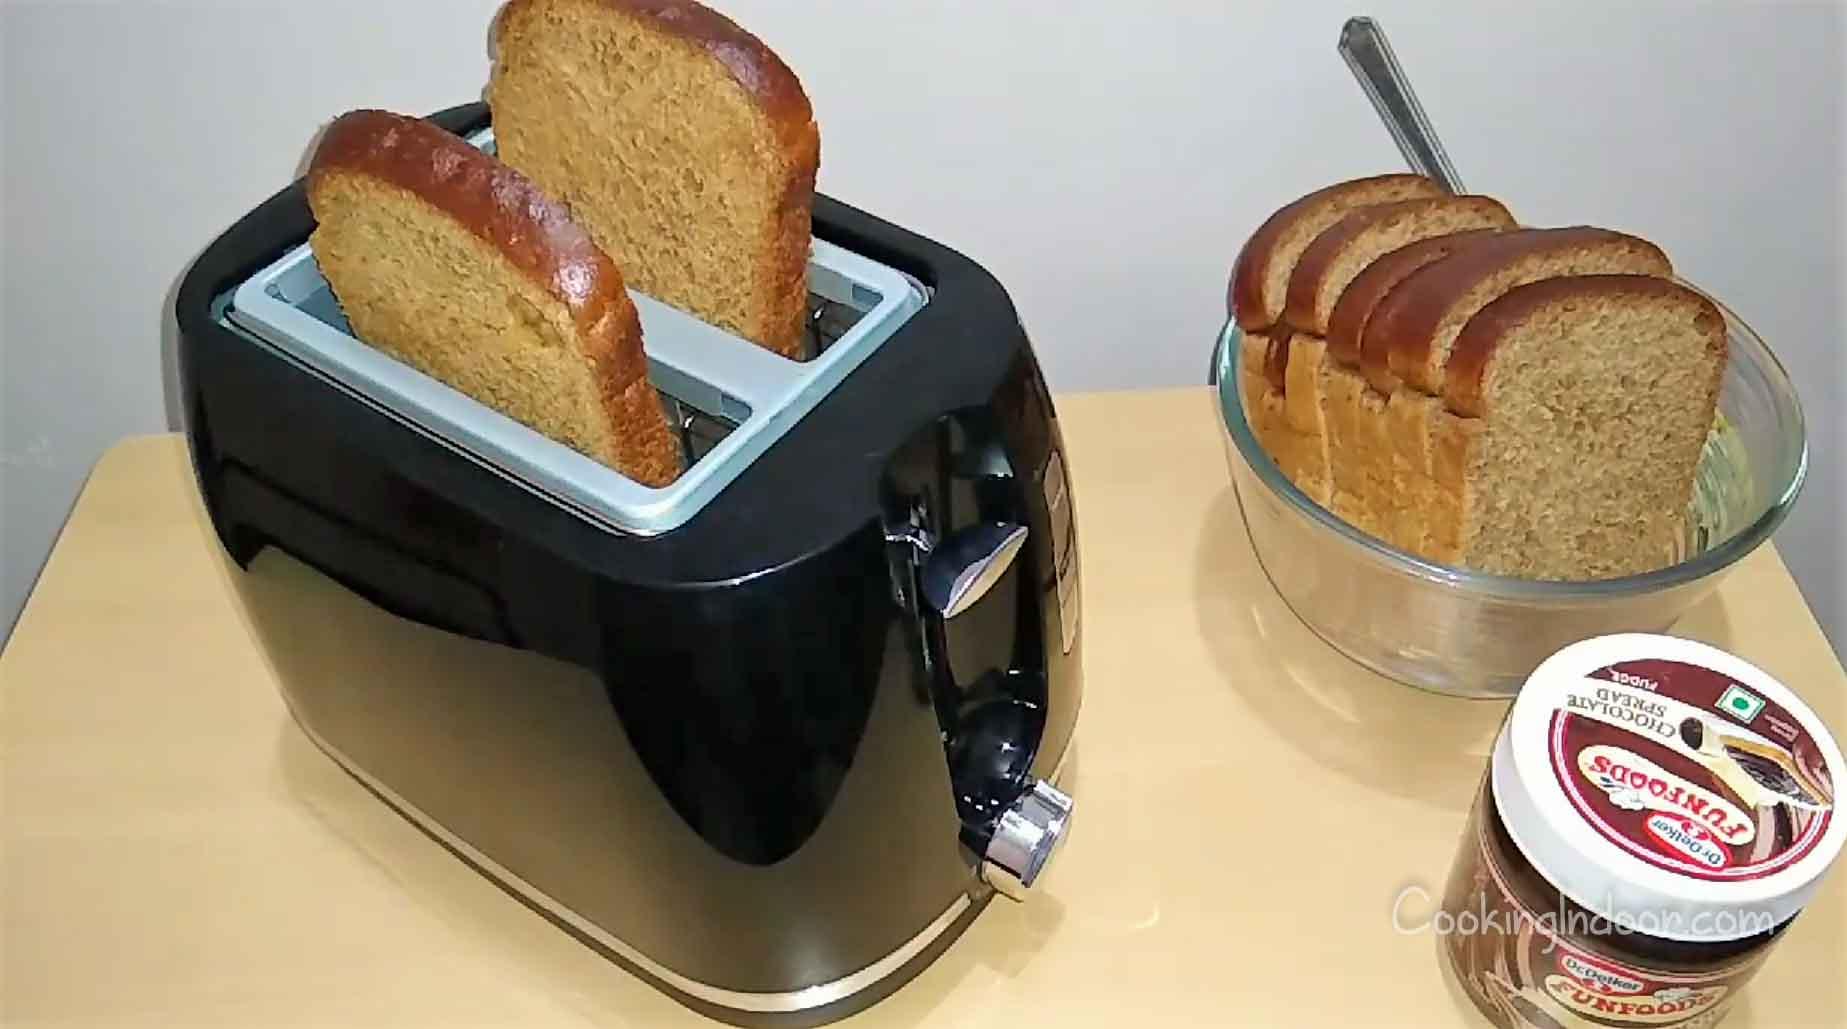 Best Black and Decker toaster